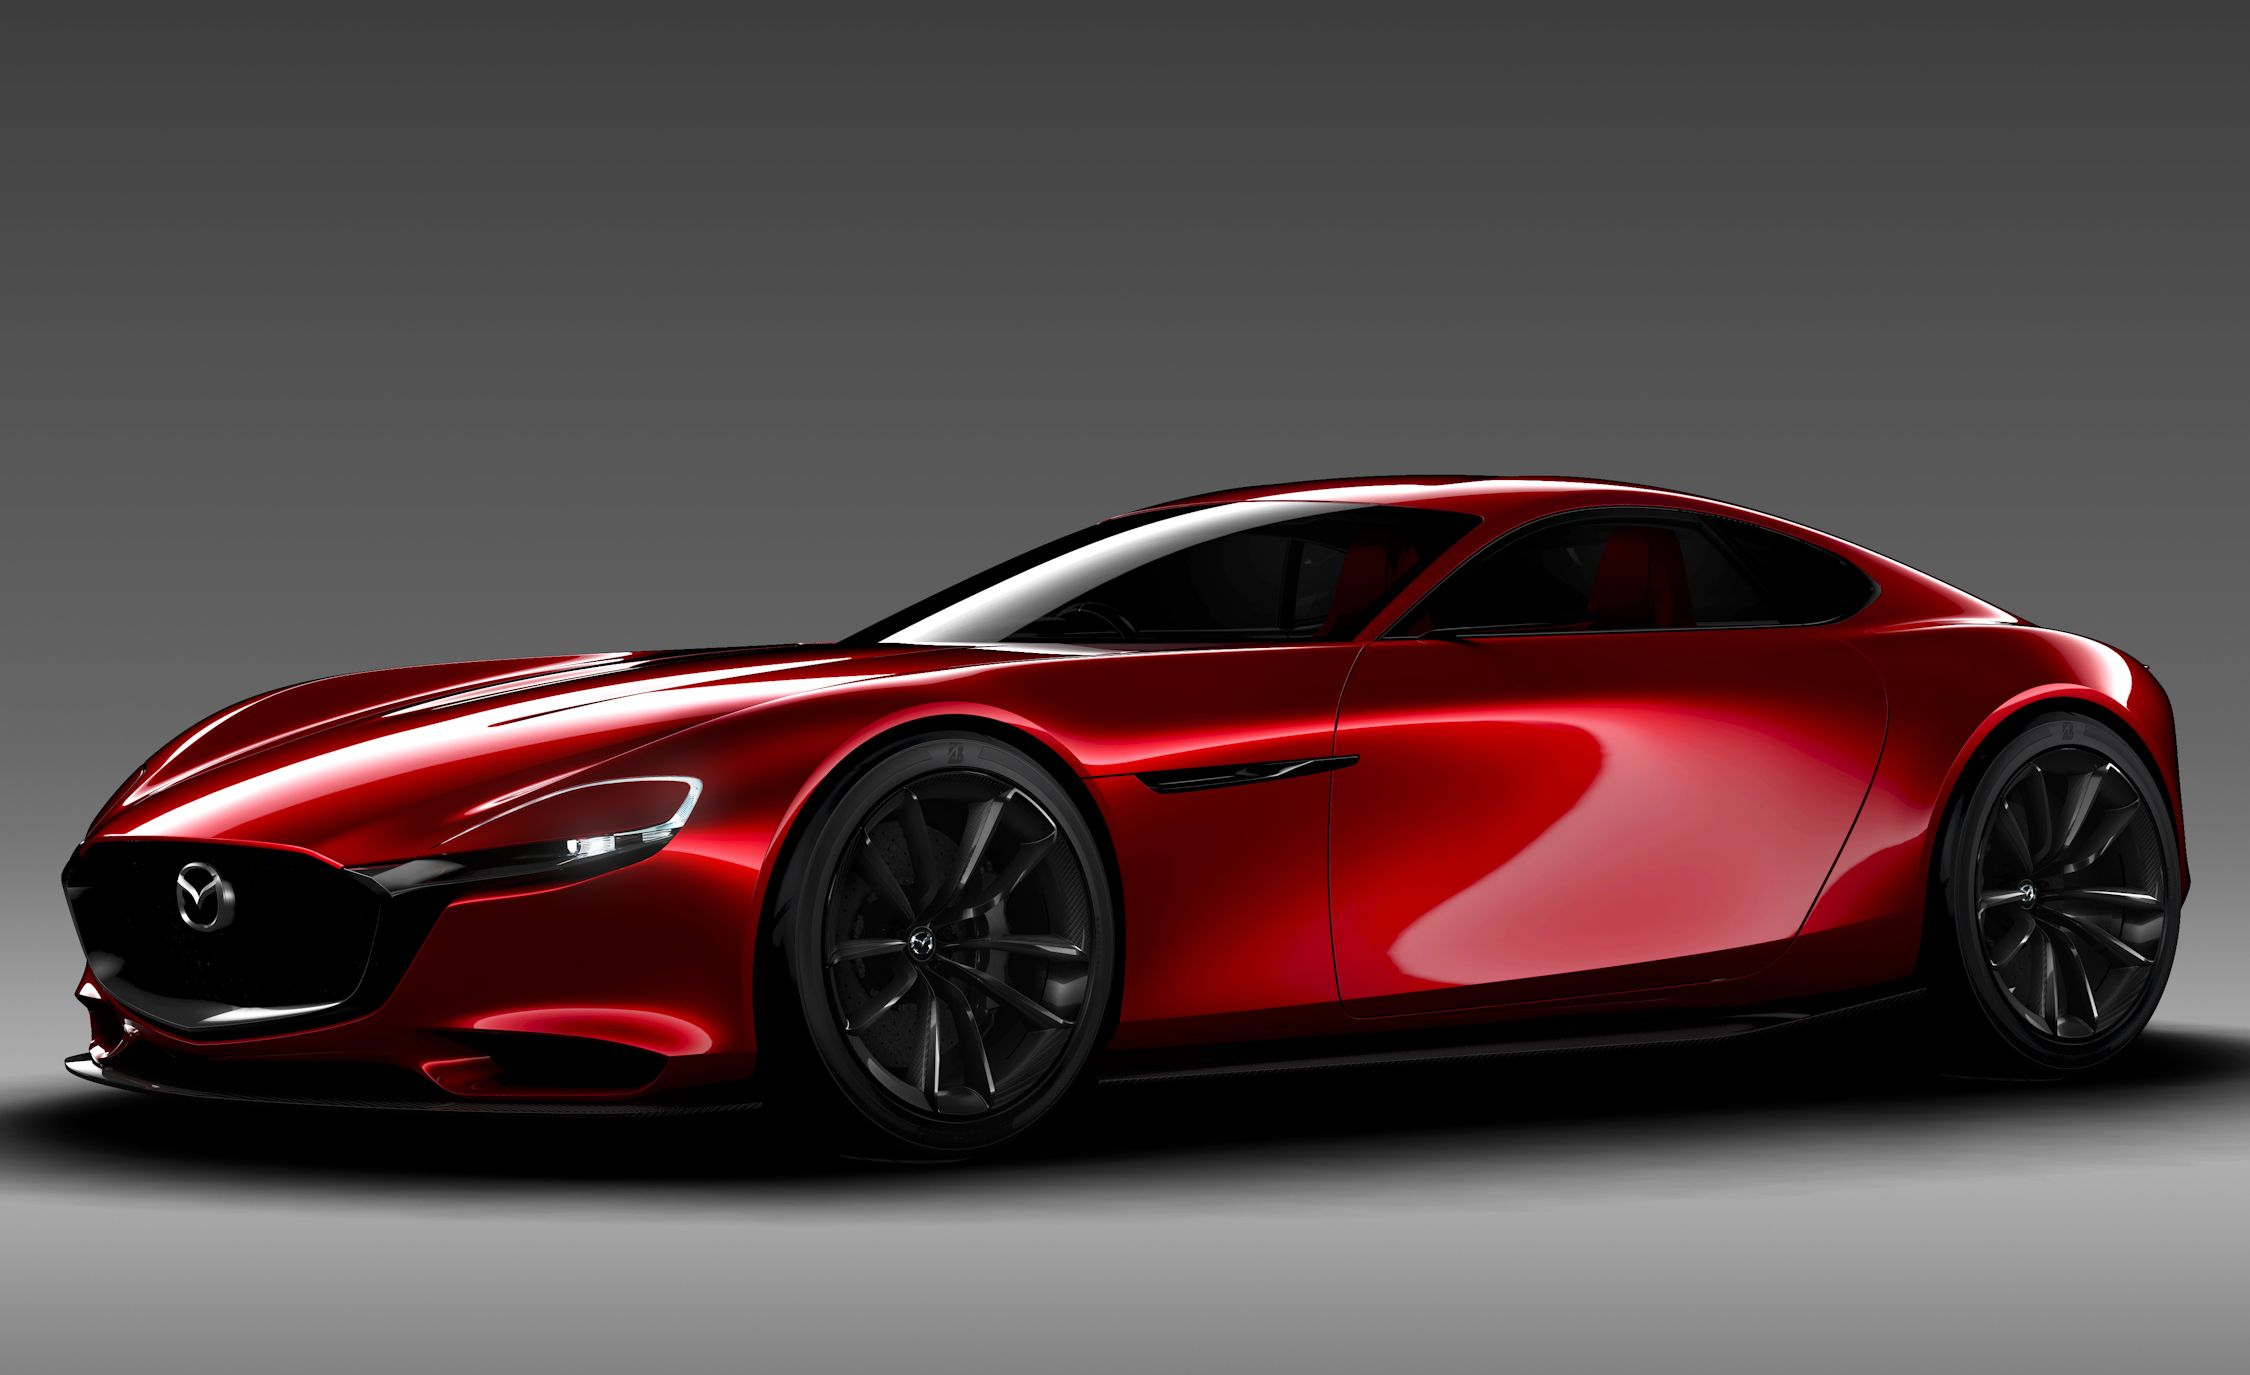 Mazda's Rotary Engine Returning (as Range Extender in an EV)